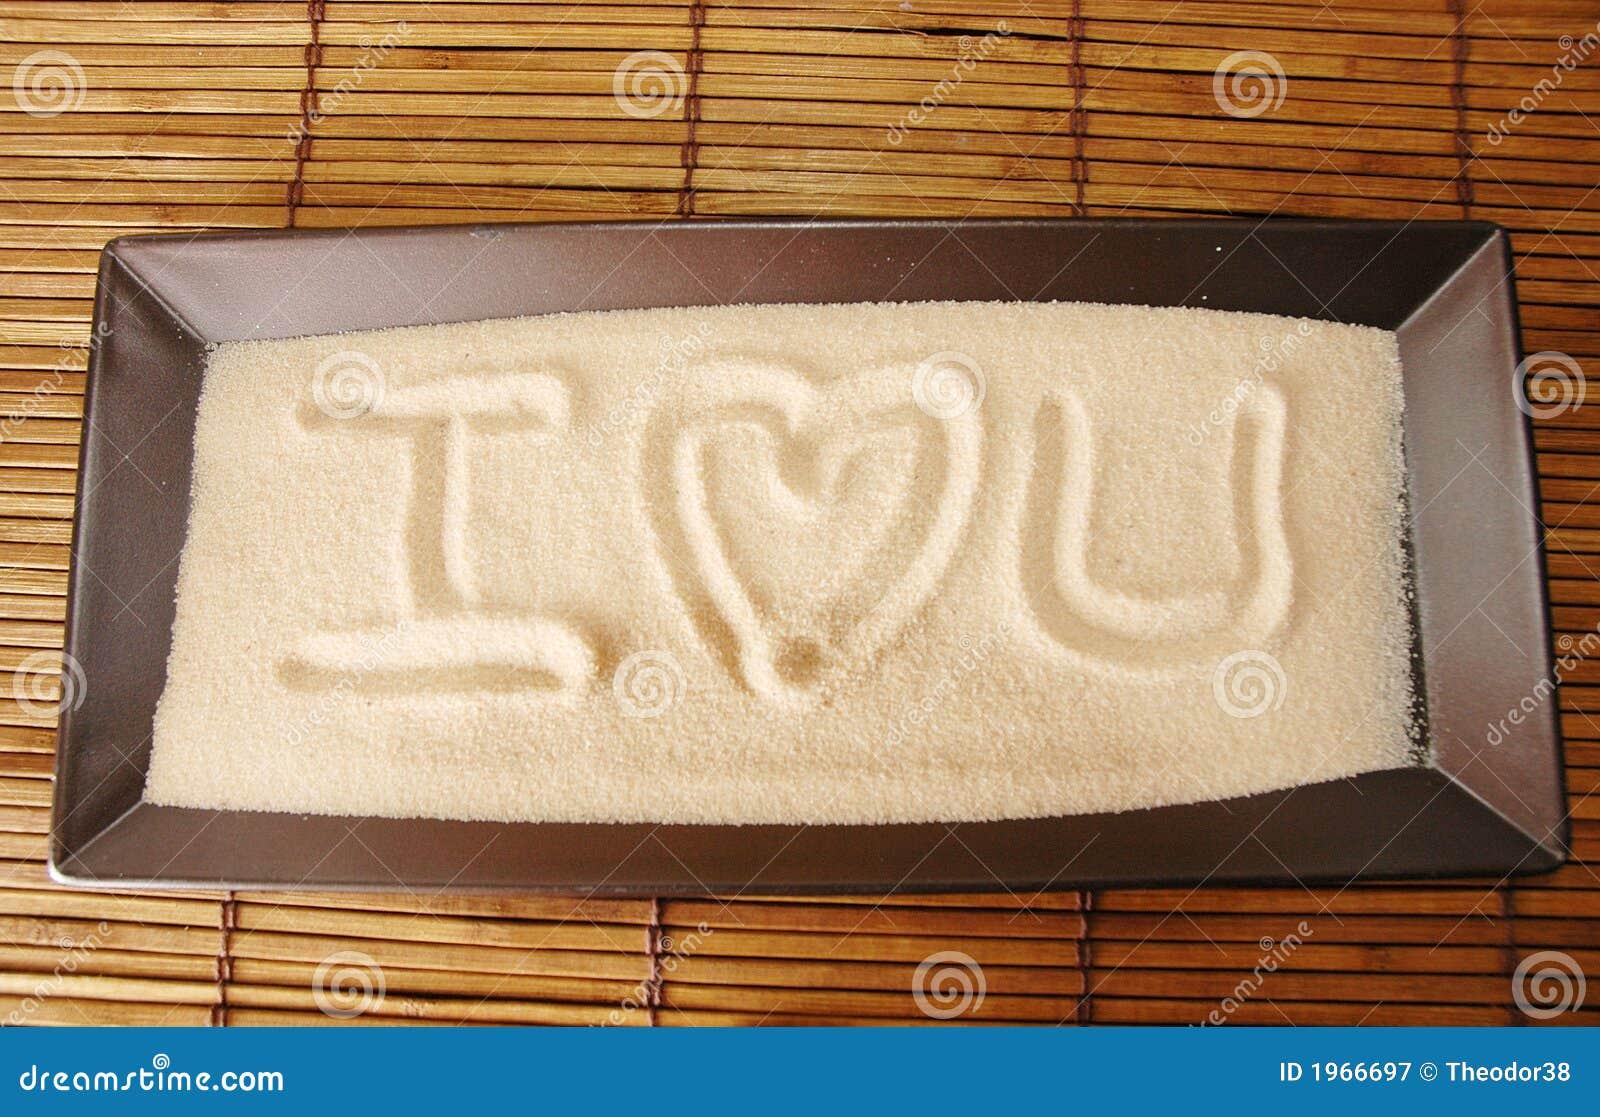 Eu Te Amo Escrito Na Areia Imagens De Stock Royalty Free: Amor Escrito Na Areia Fotografia De Stock Royalty Free